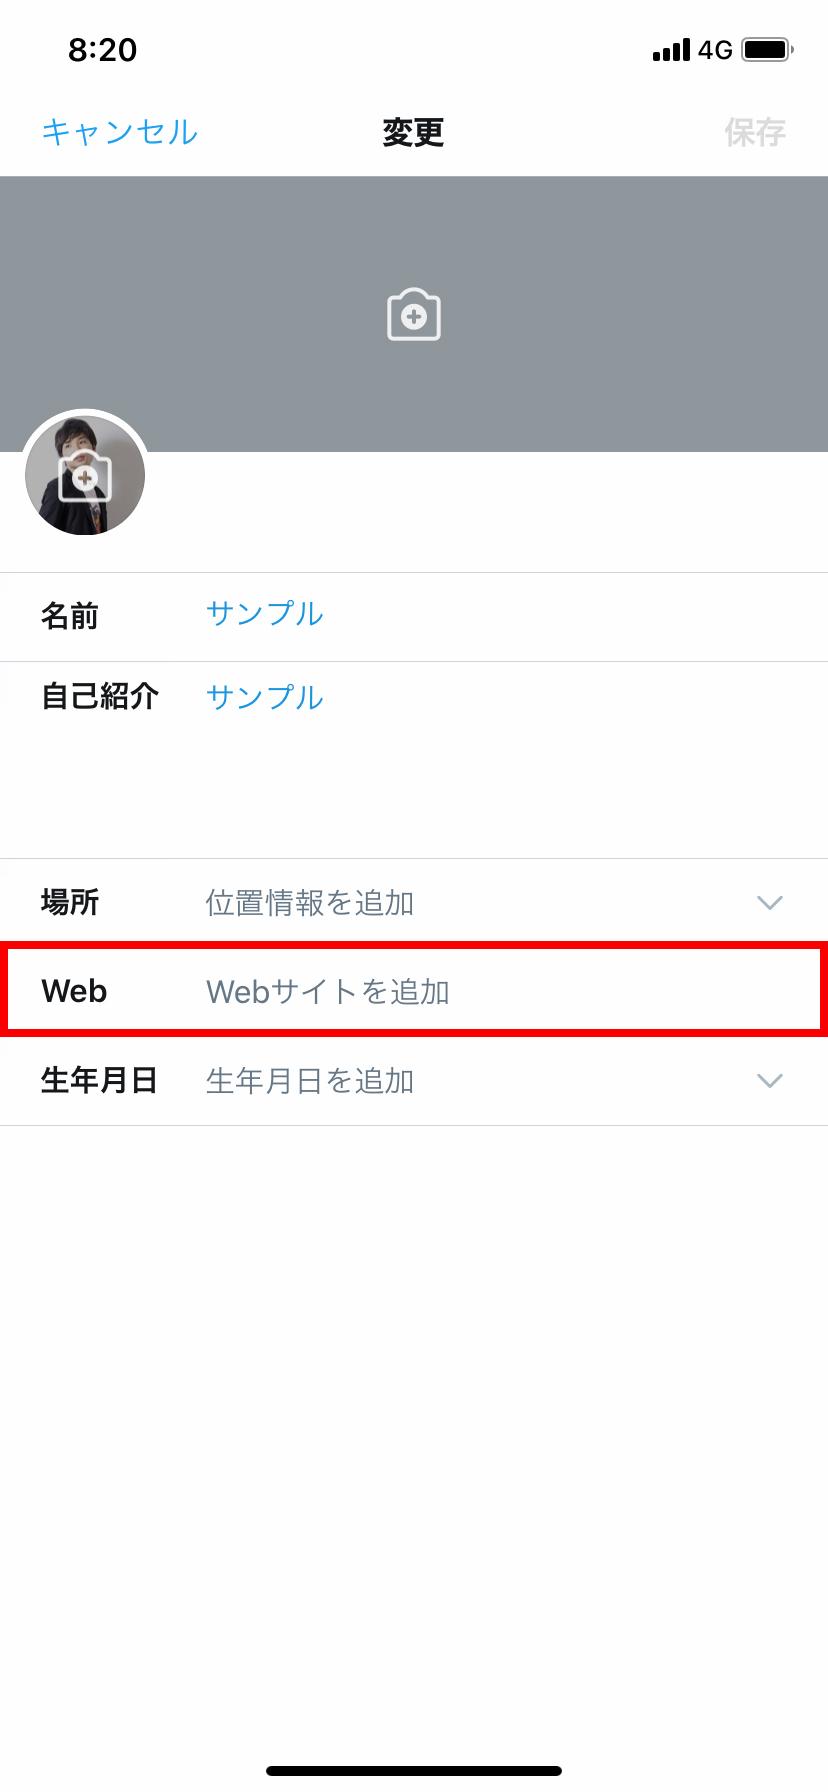 TwitterのWEBサイト